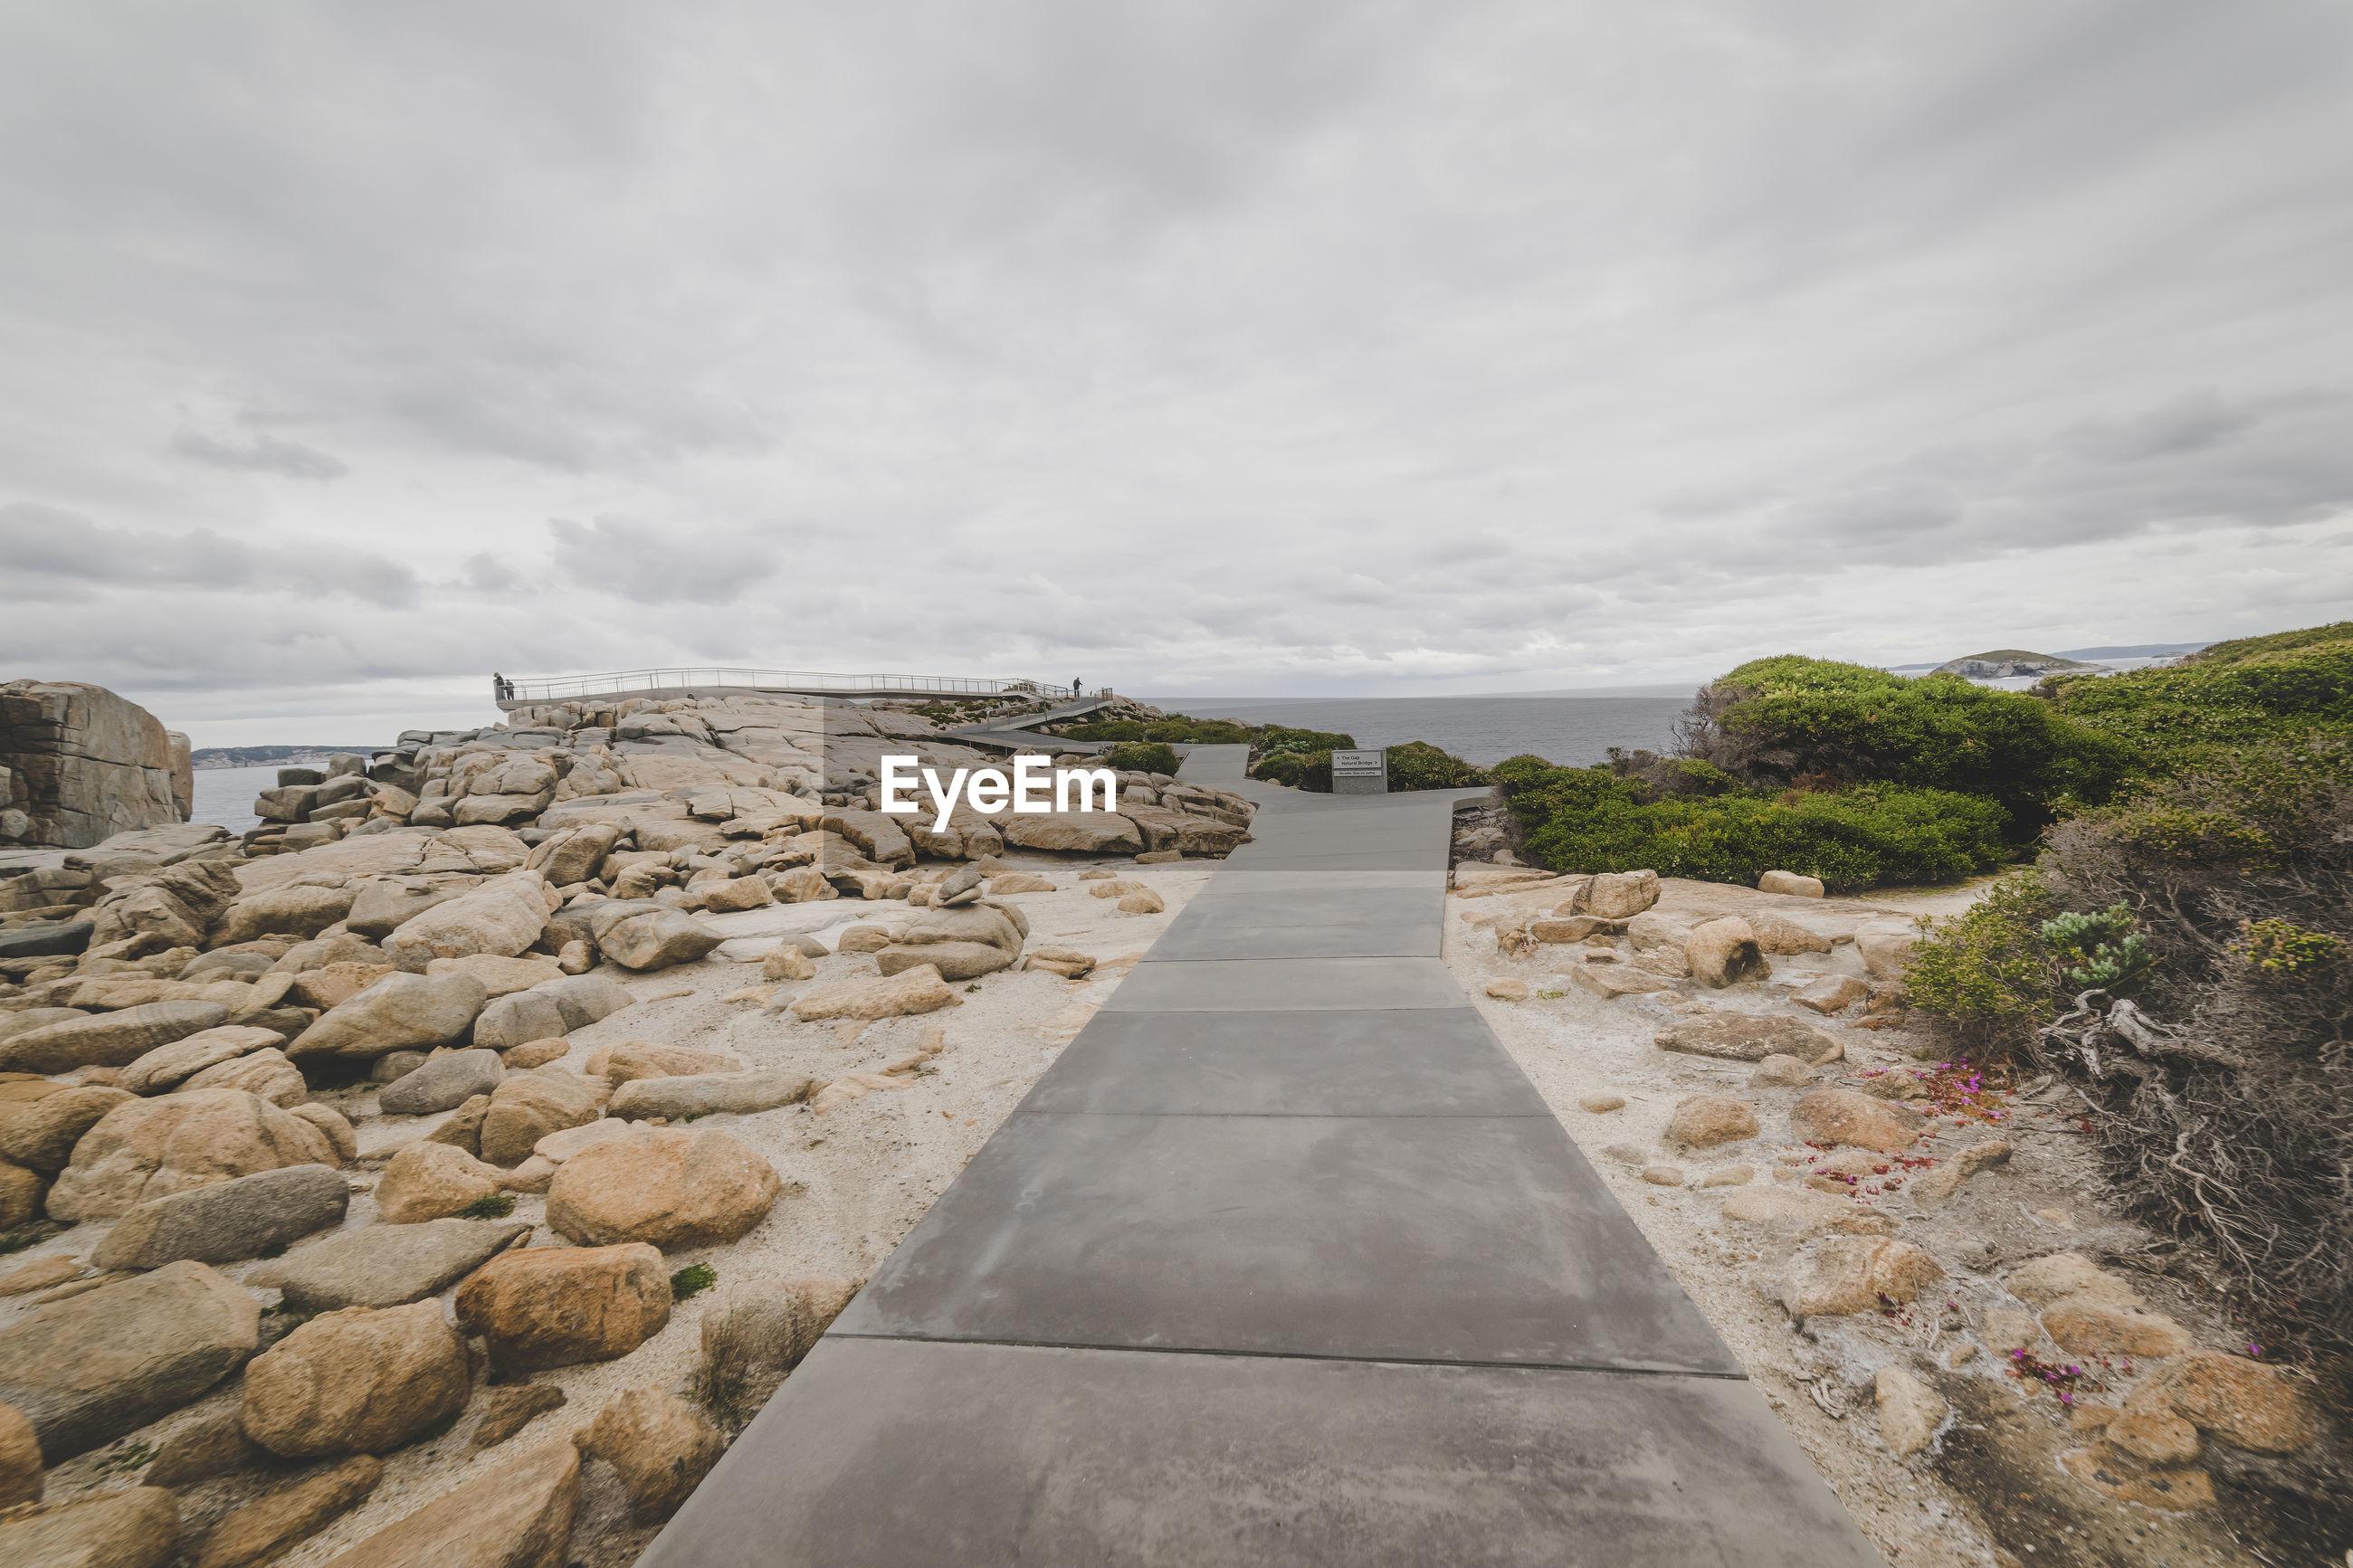 Footpath amidst rocks against sky